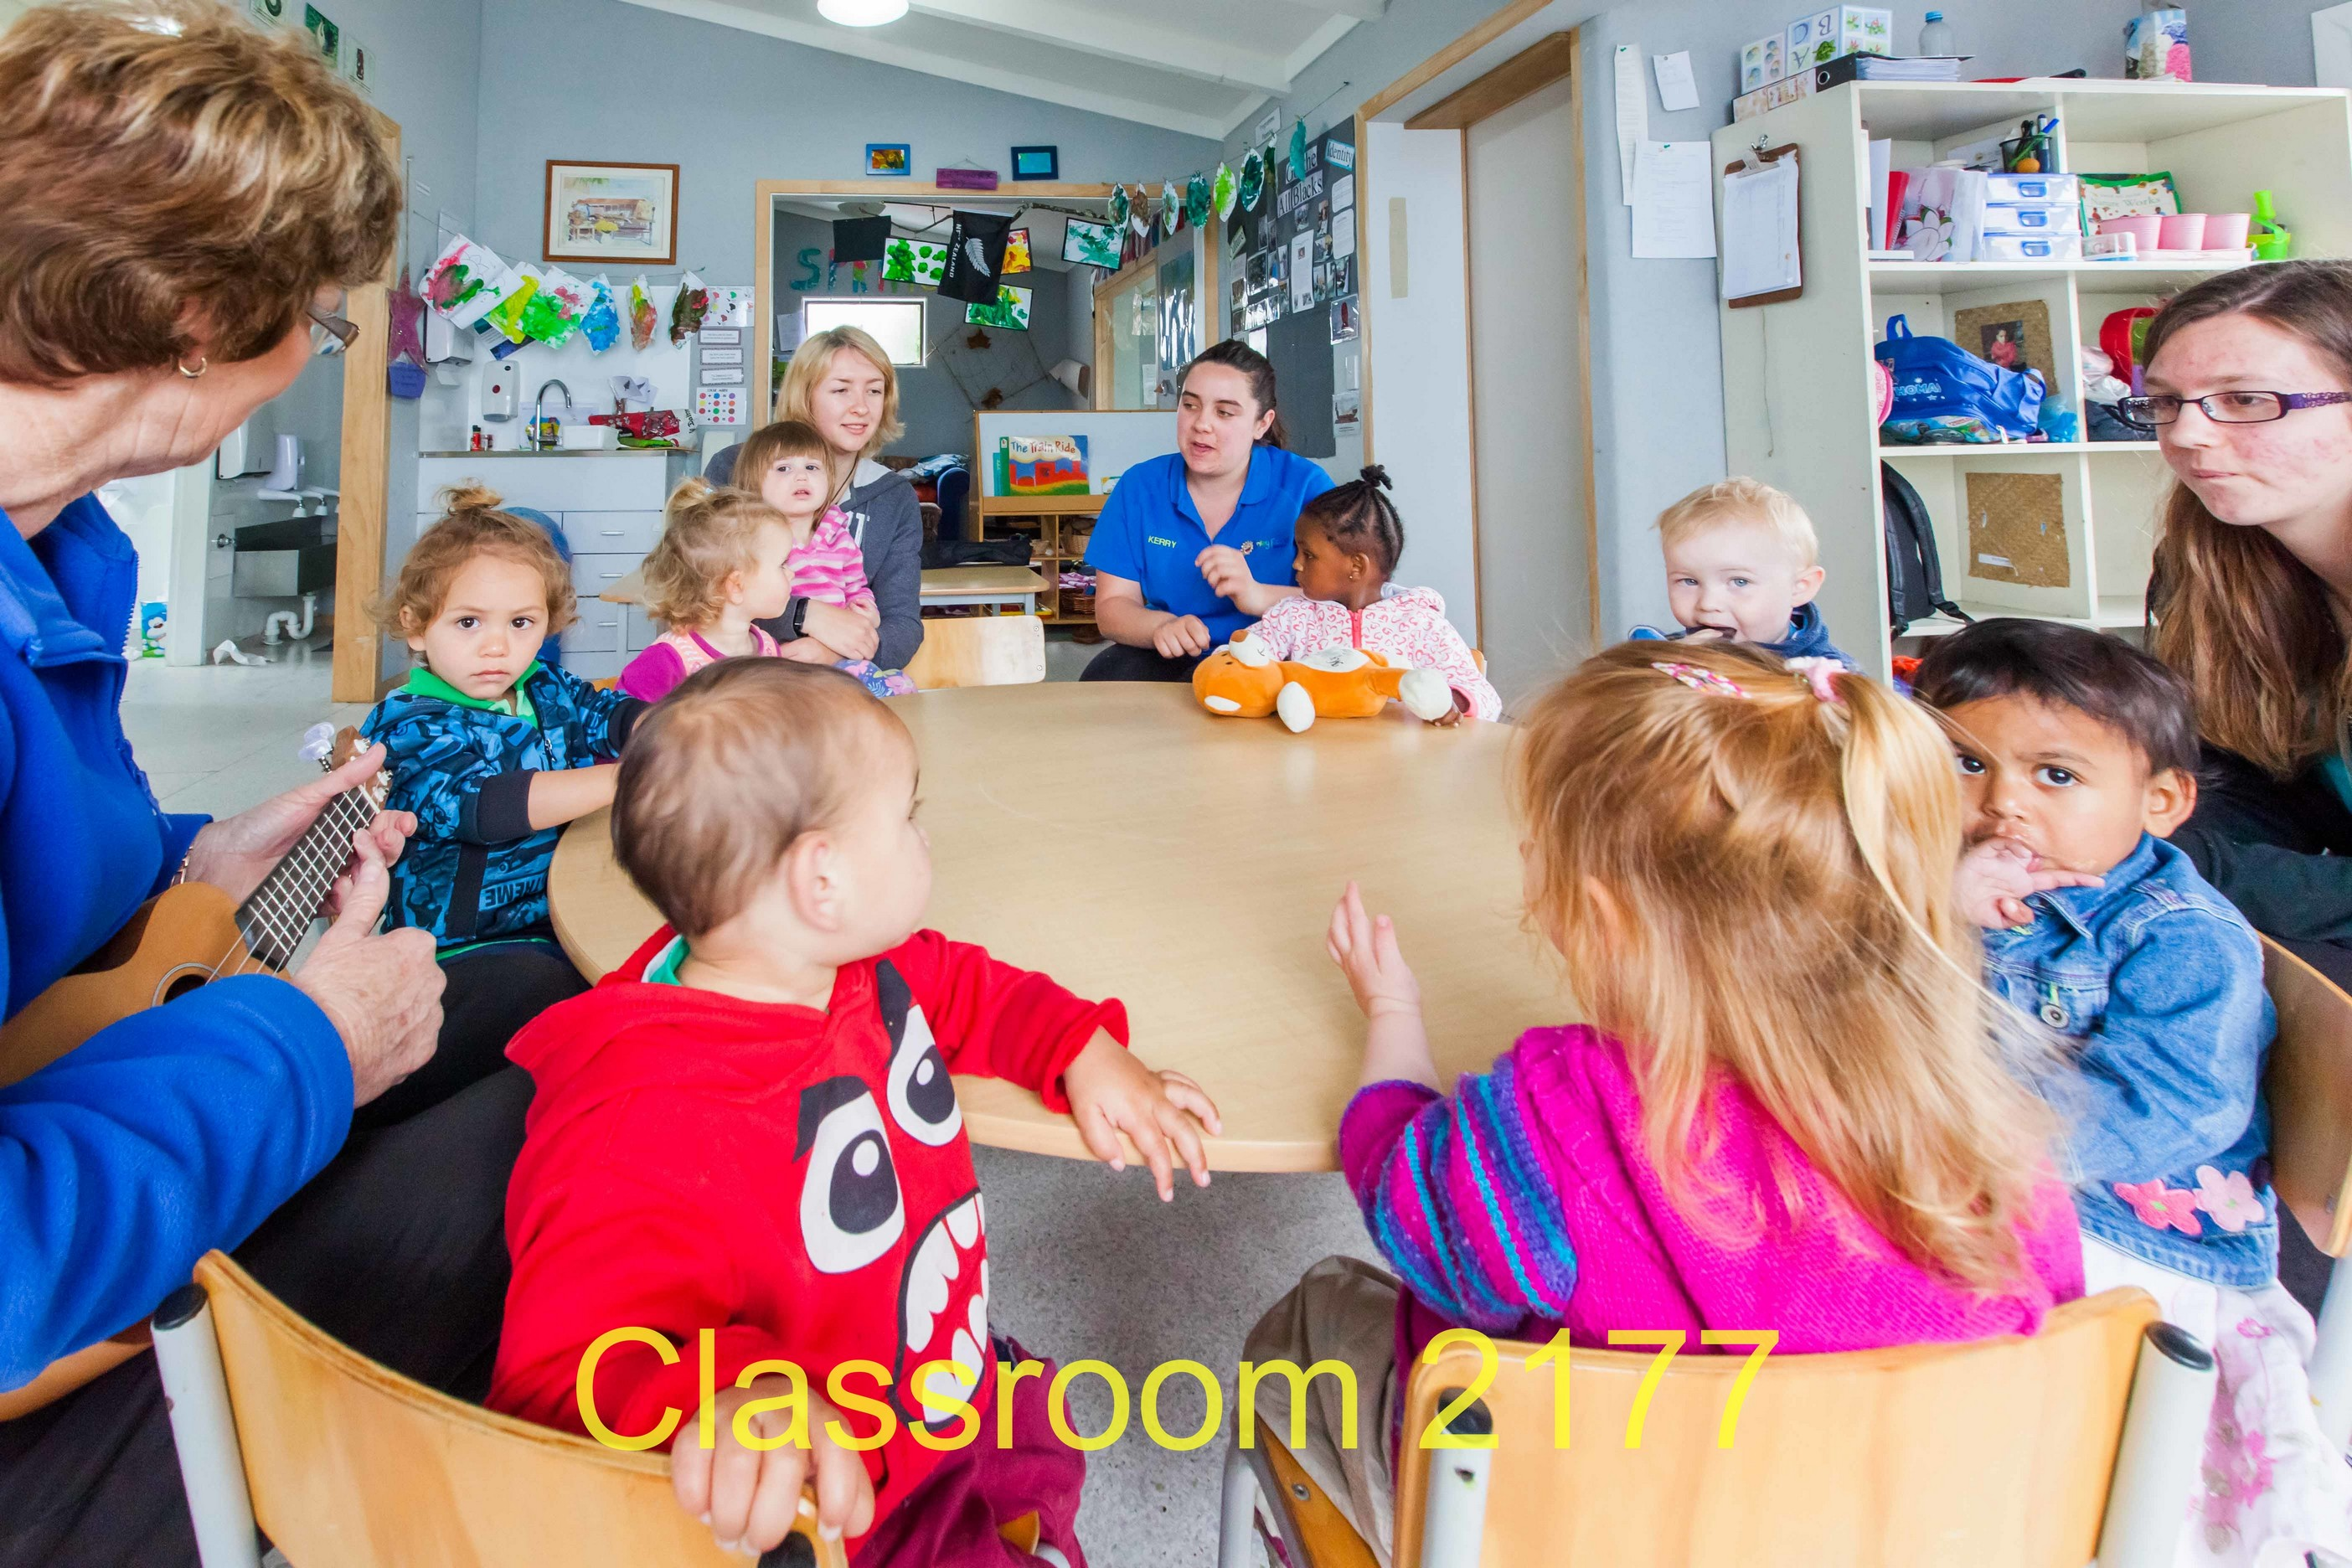 Classroom 2177